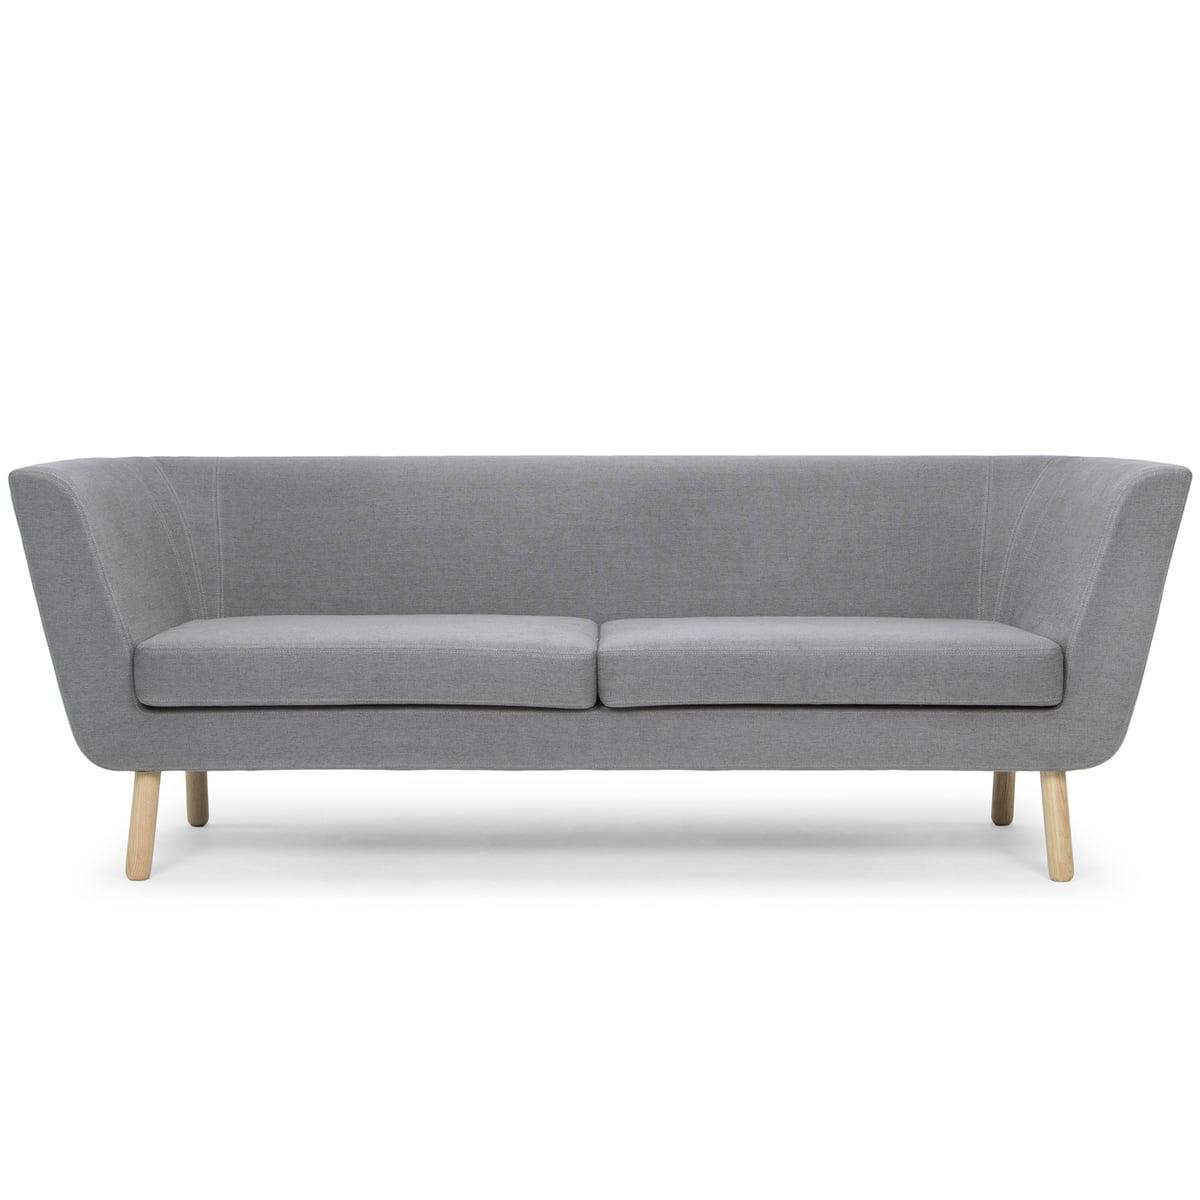 Ecksofa designklassiker  Nest Sofa von Design House Stockholm